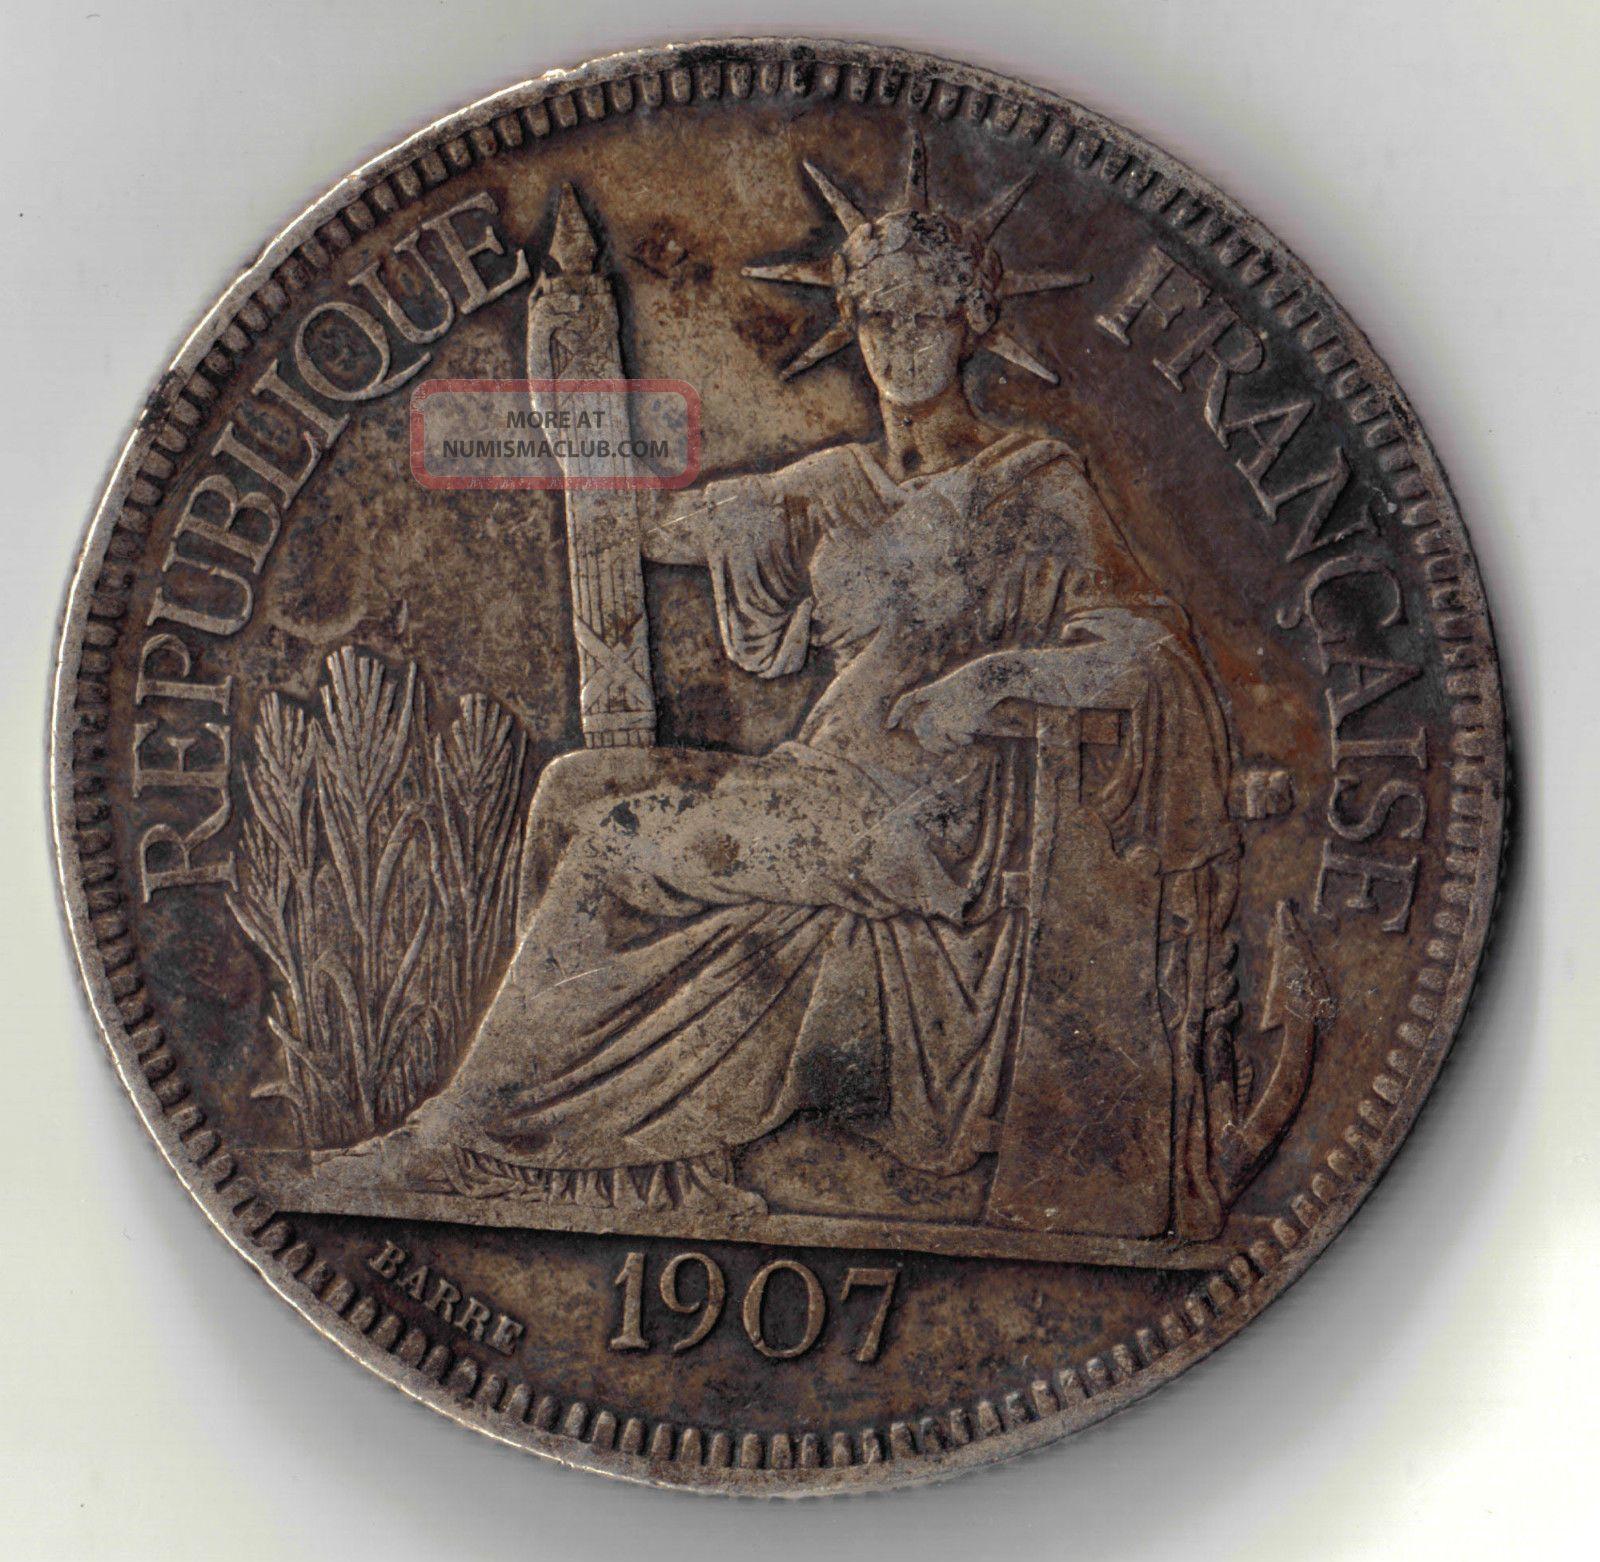 1907 French Indo China Silver Piastre De Commerce 27 Gram Coin